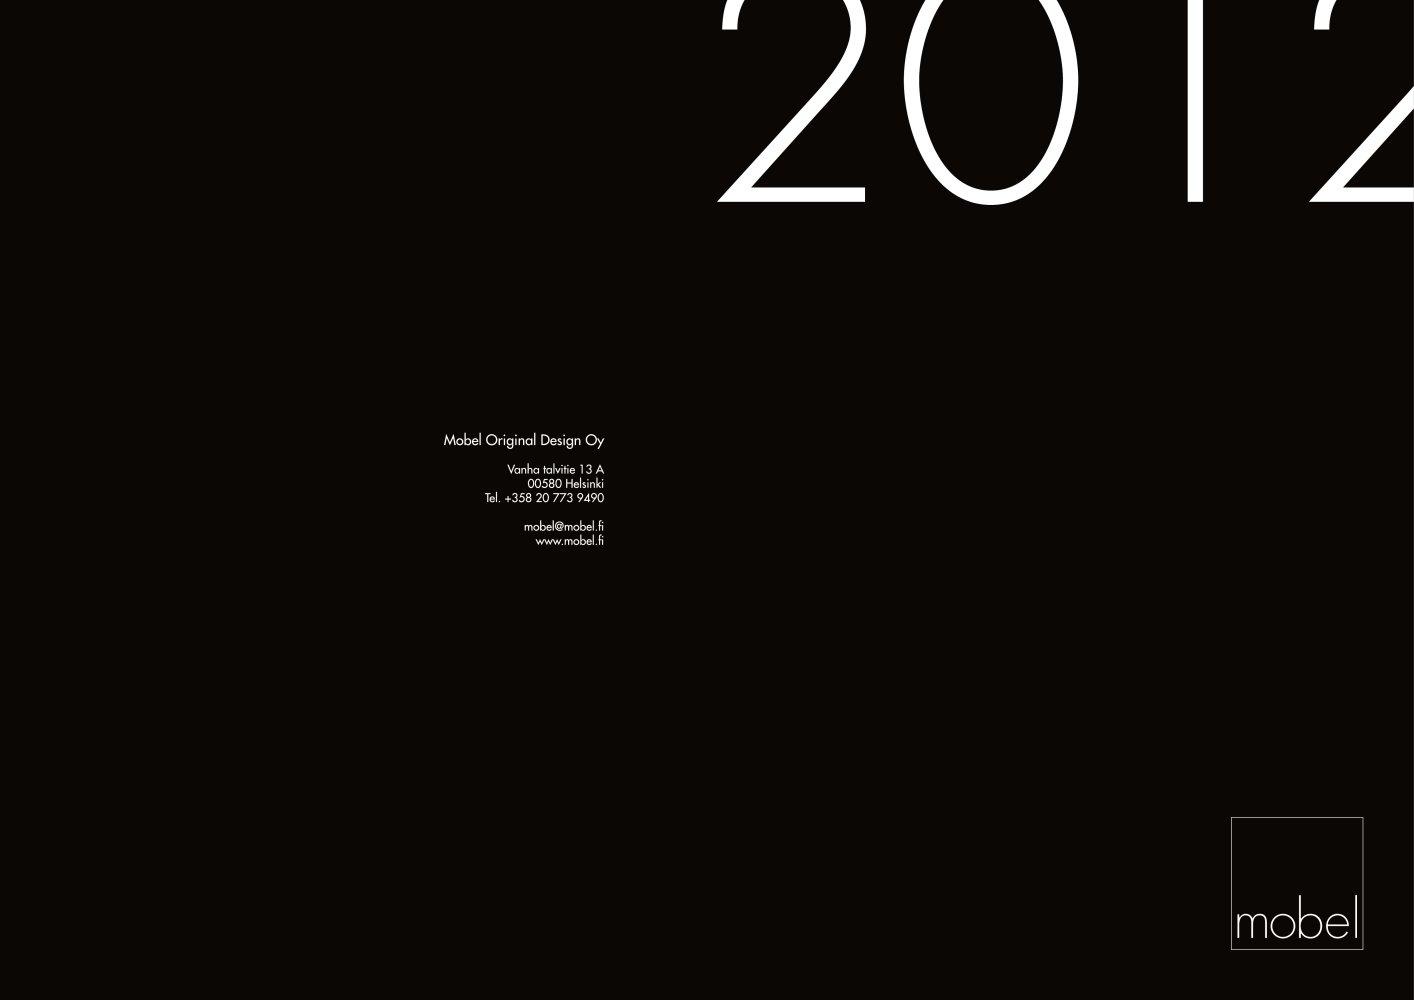 Mobel auditoriums Opus, Lec, Less   mobel   PDF Catalogues